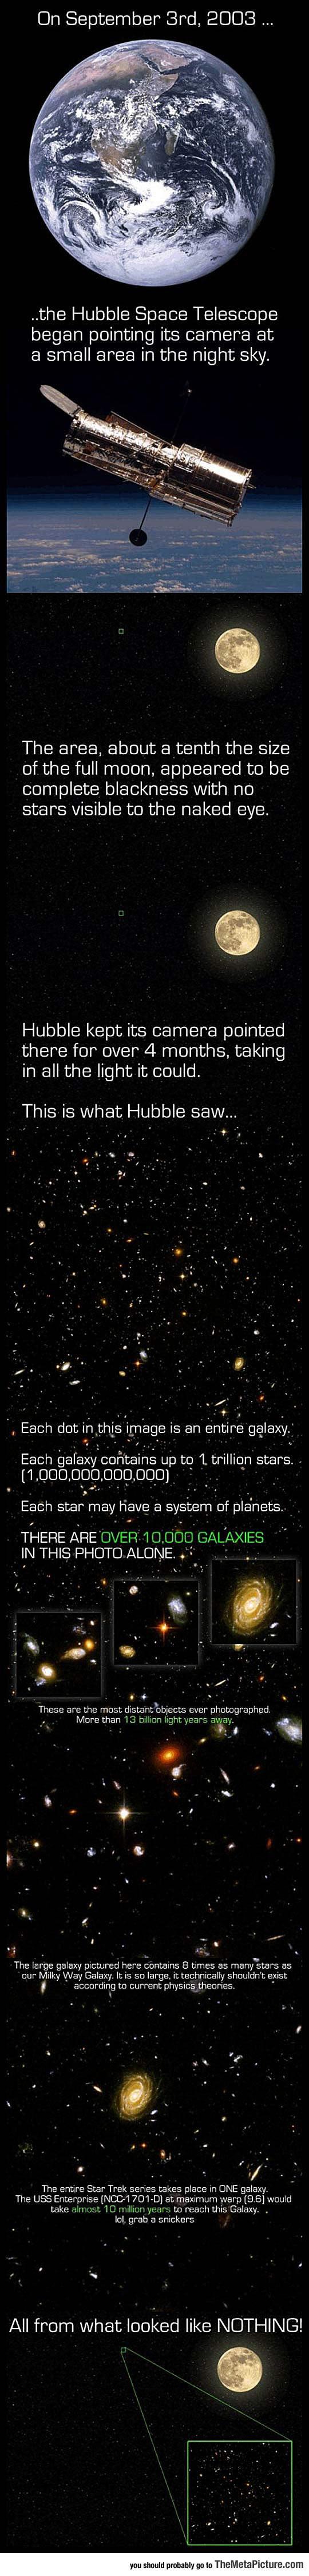 science-Space-Telescope-camera-sky-earth